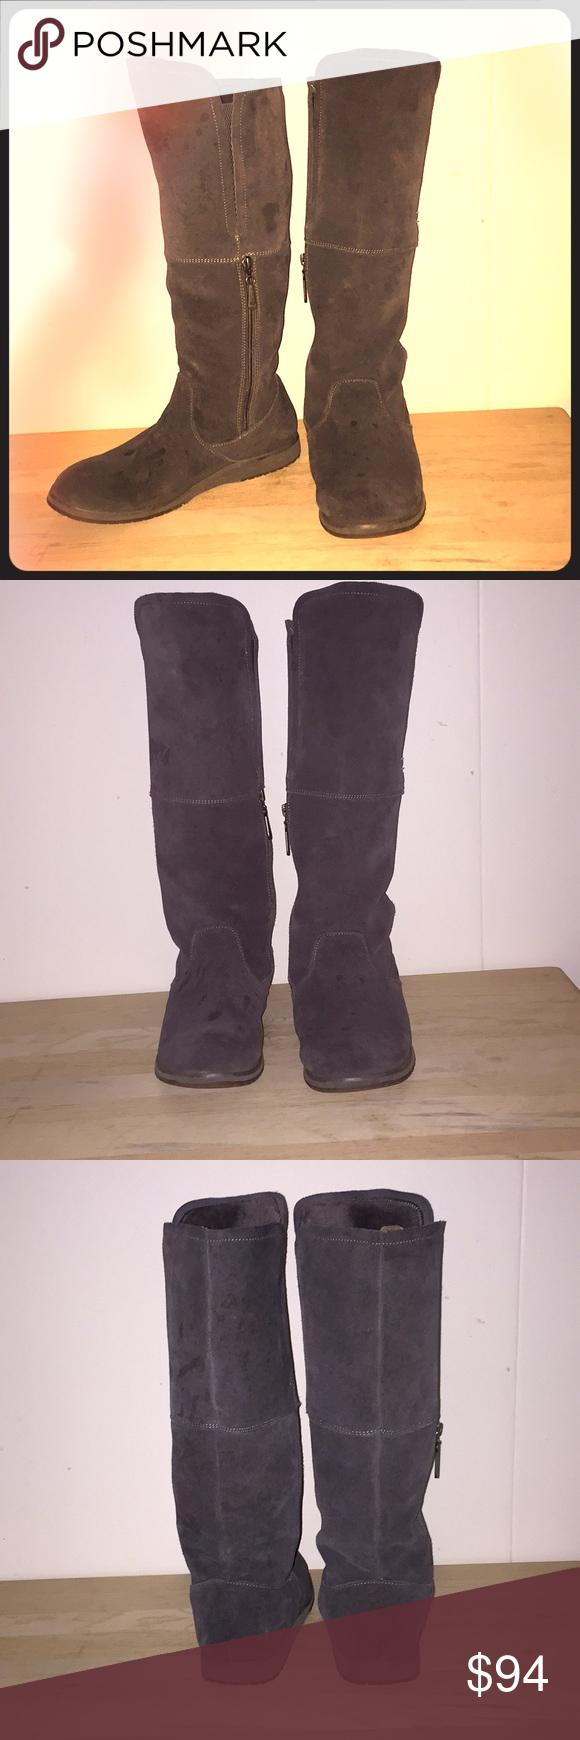 33cd1b3e714 Emu Australia 100% Merino Wool Boots Ugg Style Zip Side zip ...